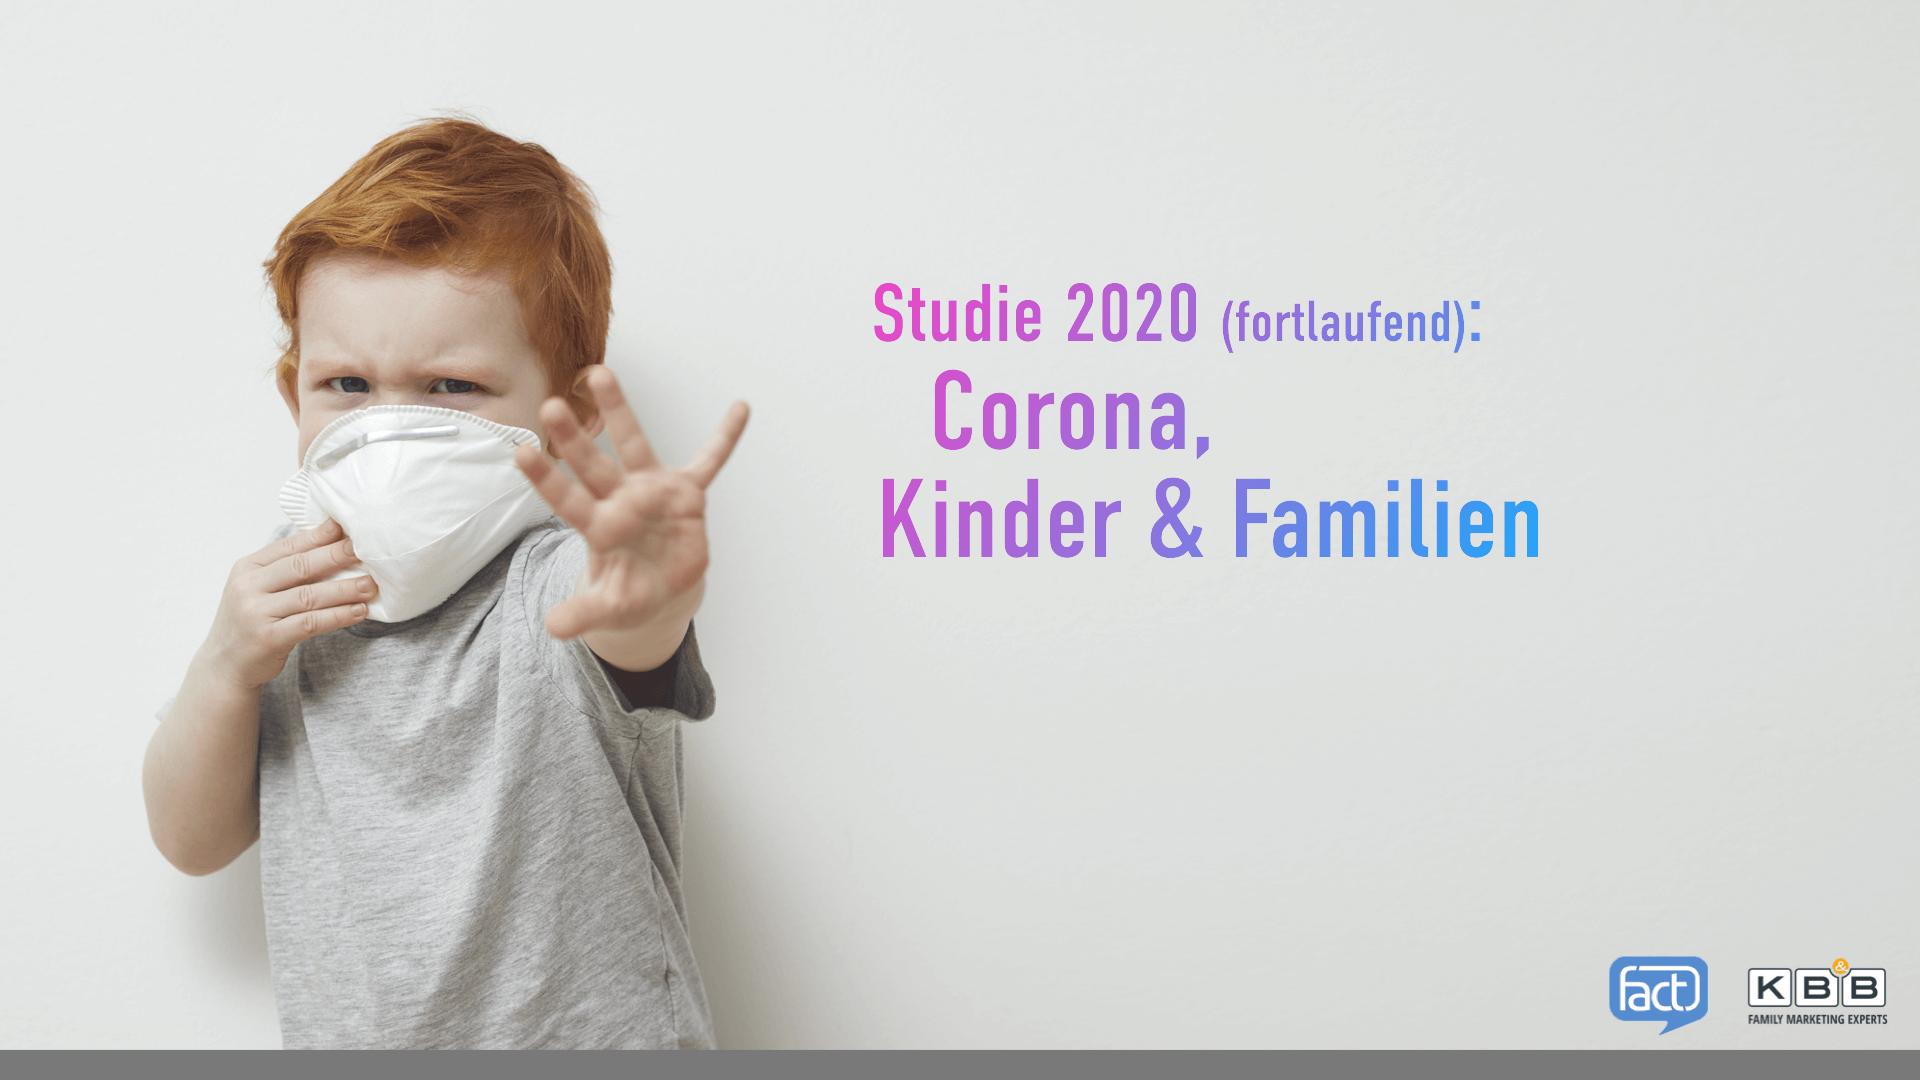 Studie: Corona, Kinder &Familien - 2020